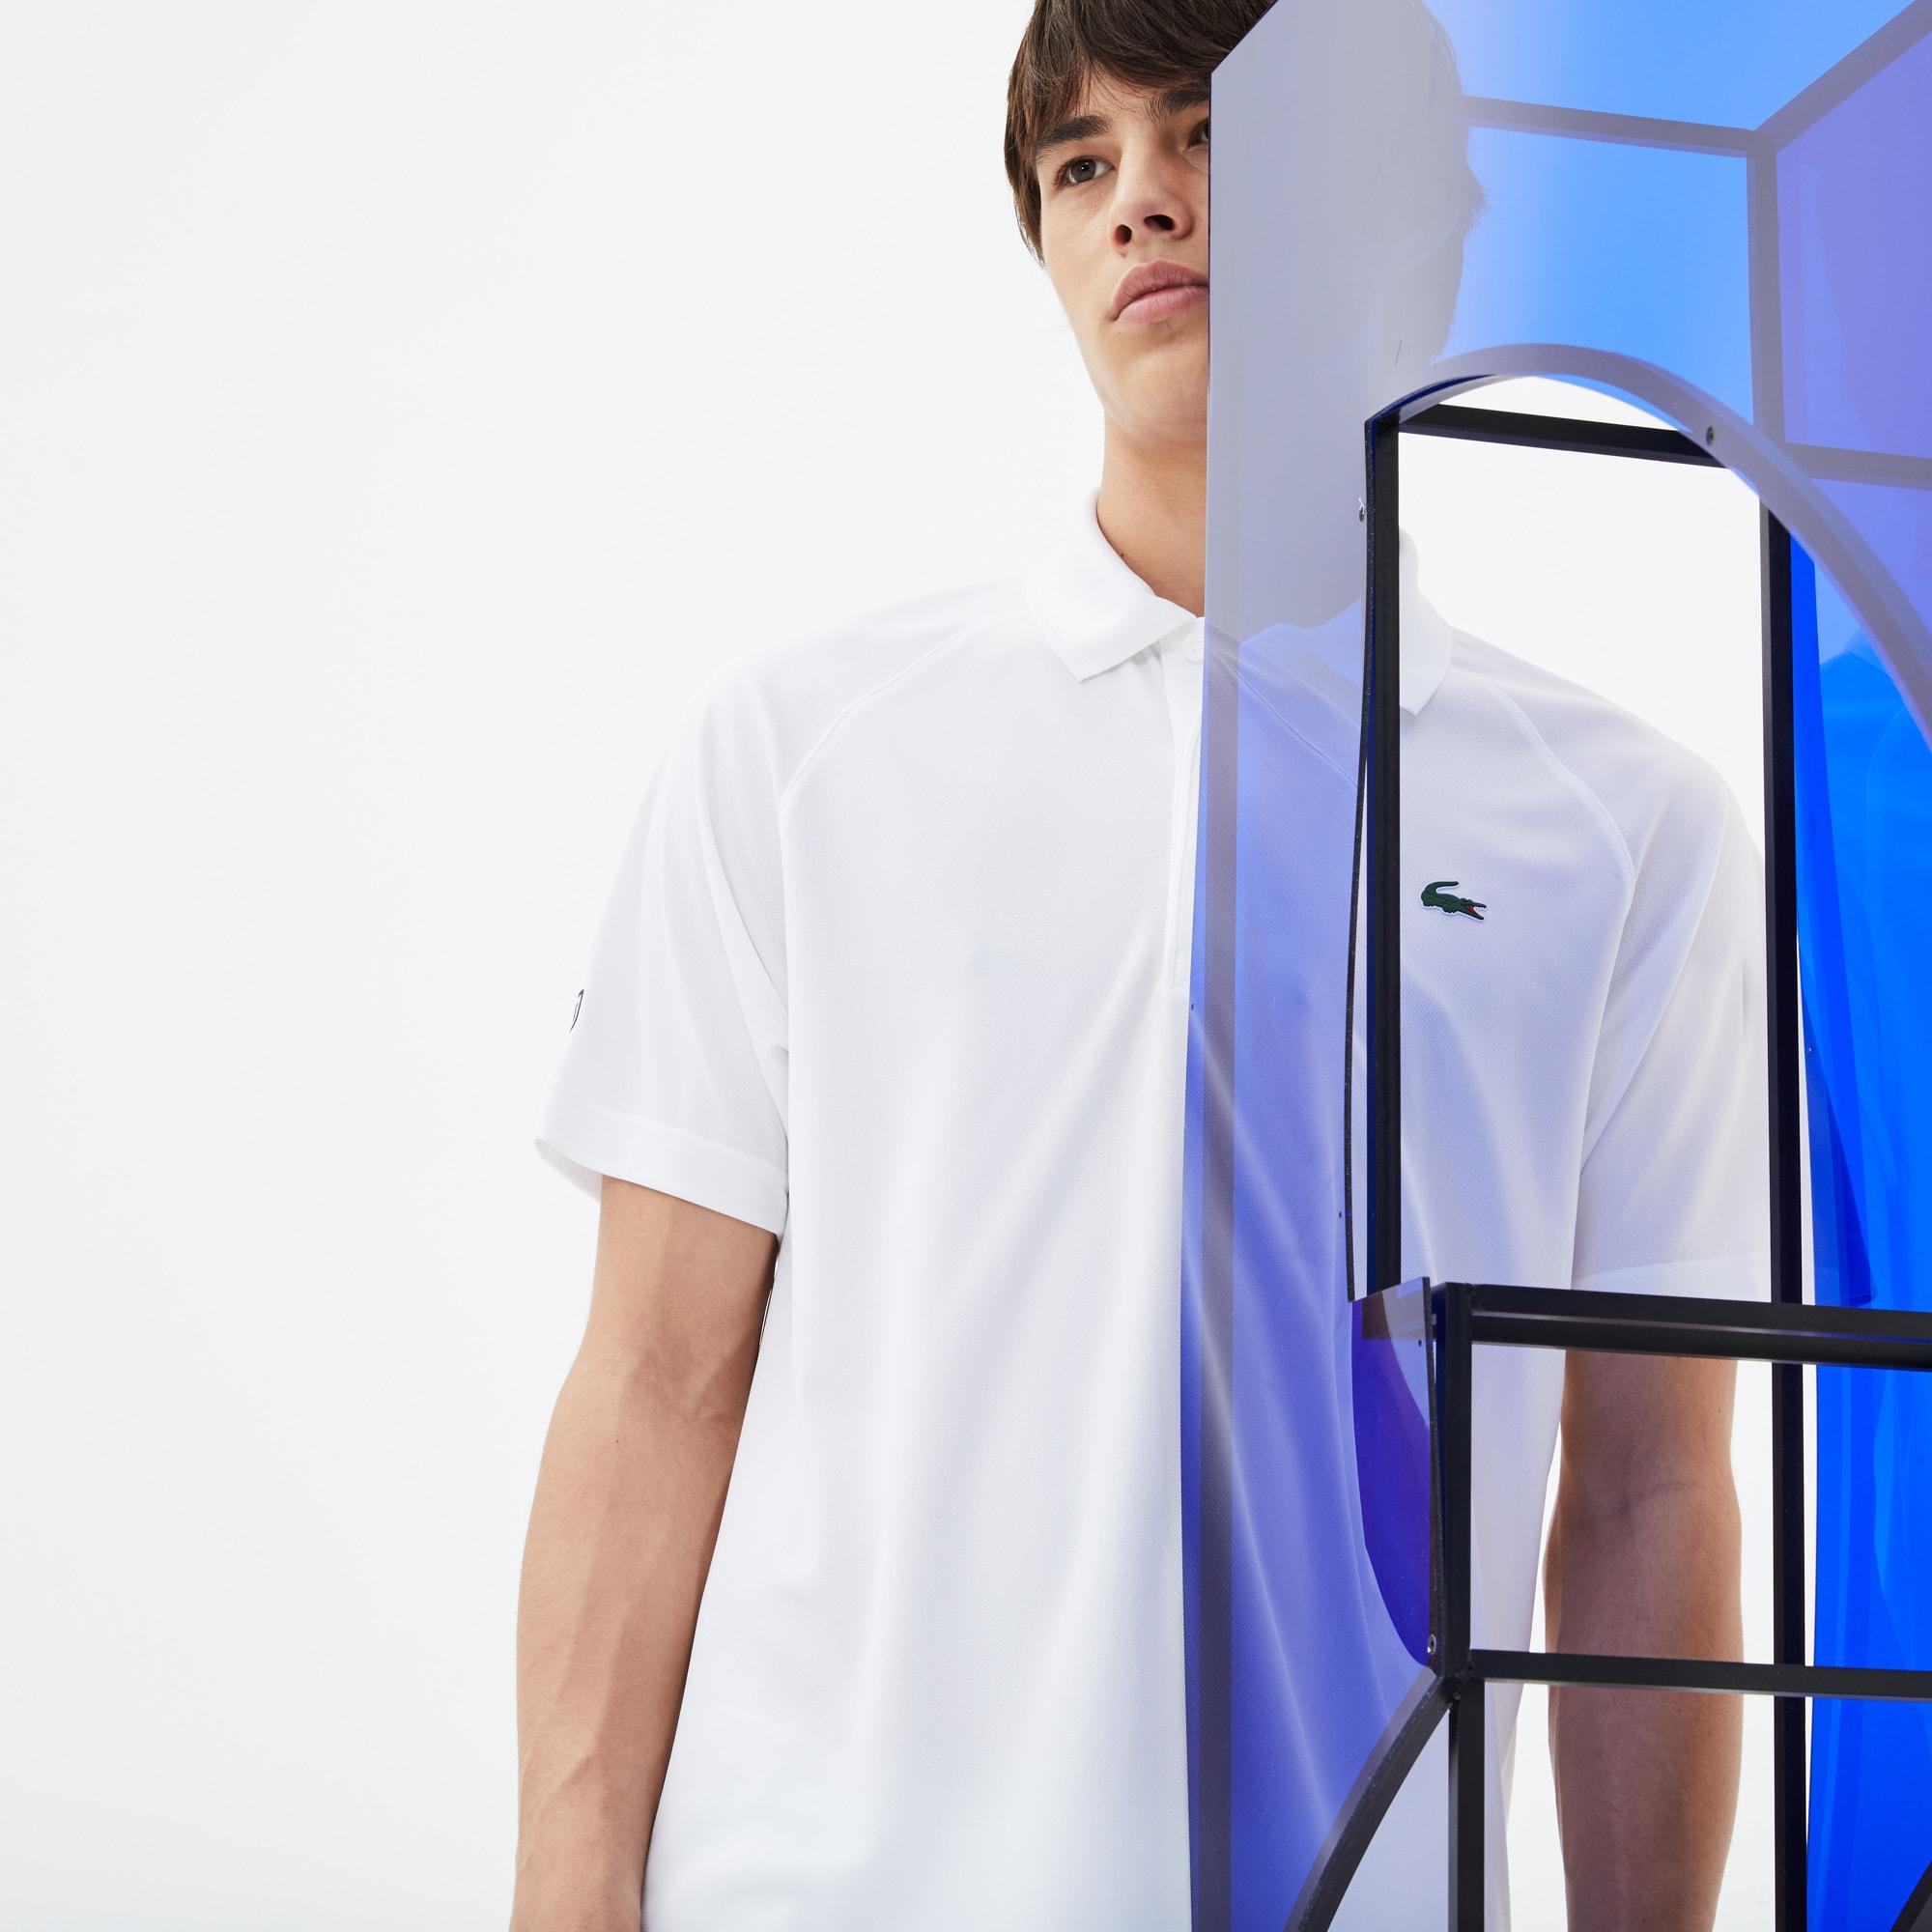 Polo Lacoste Collection pour Novak Djokovic -  Exclusive Green Edition